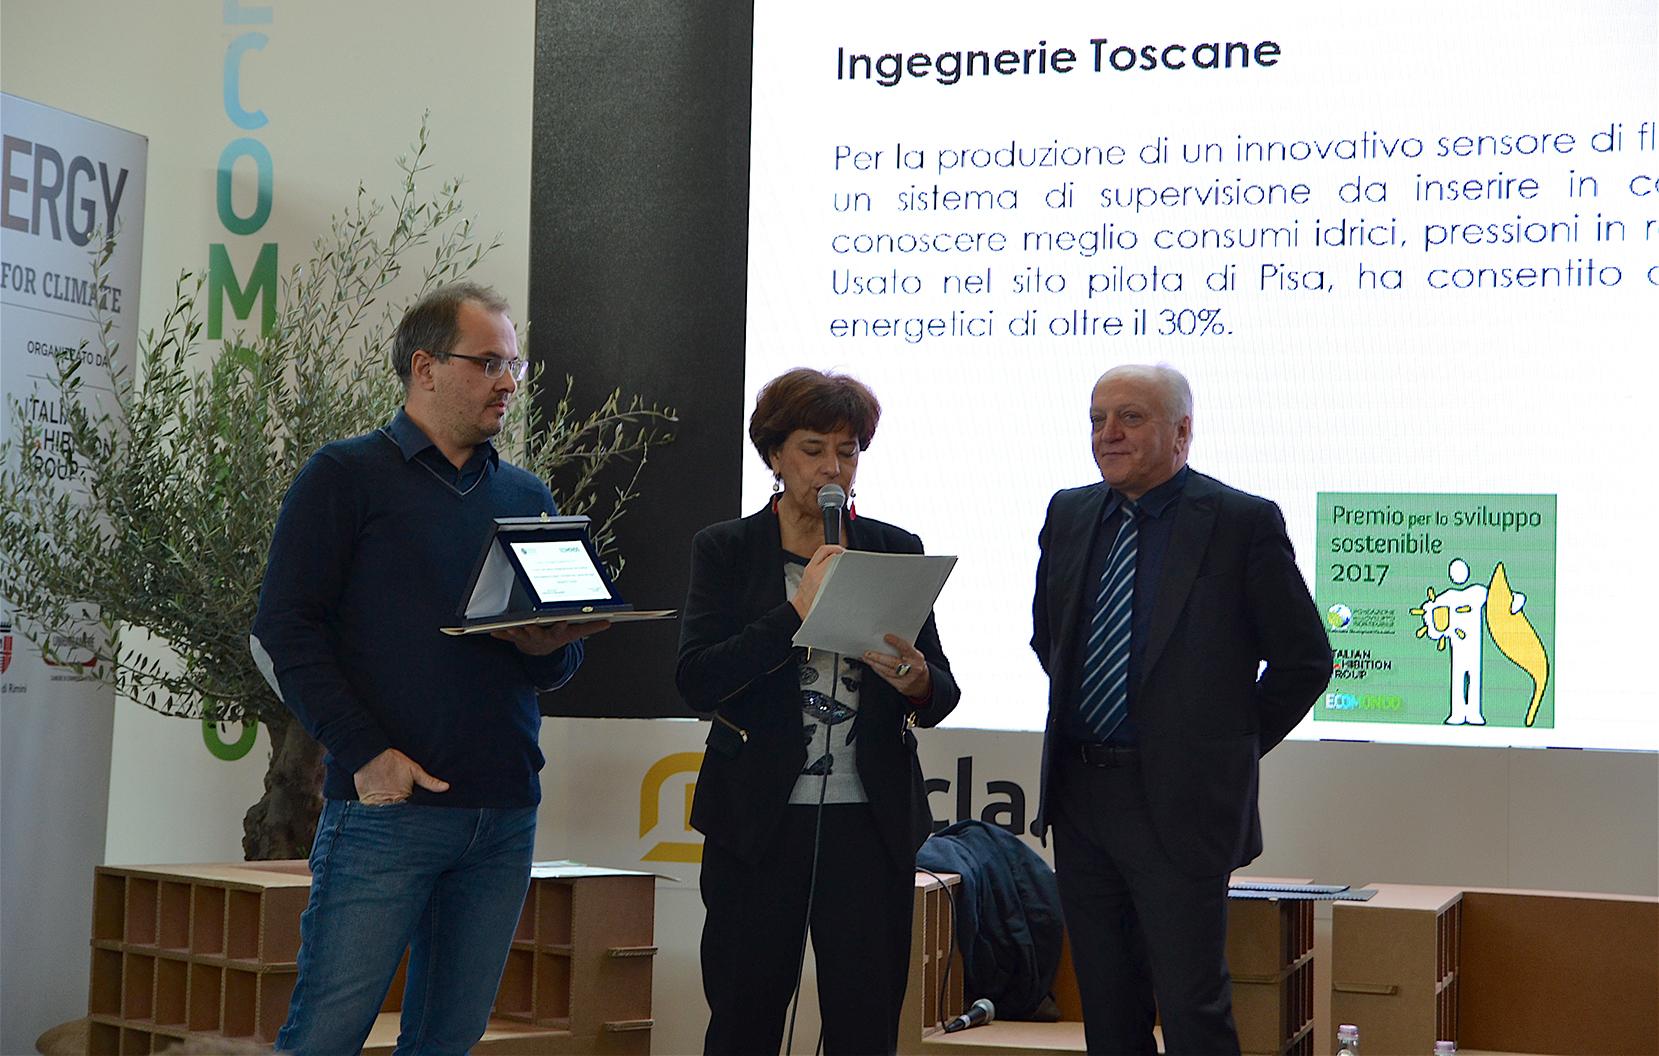 ingengerie-toscane